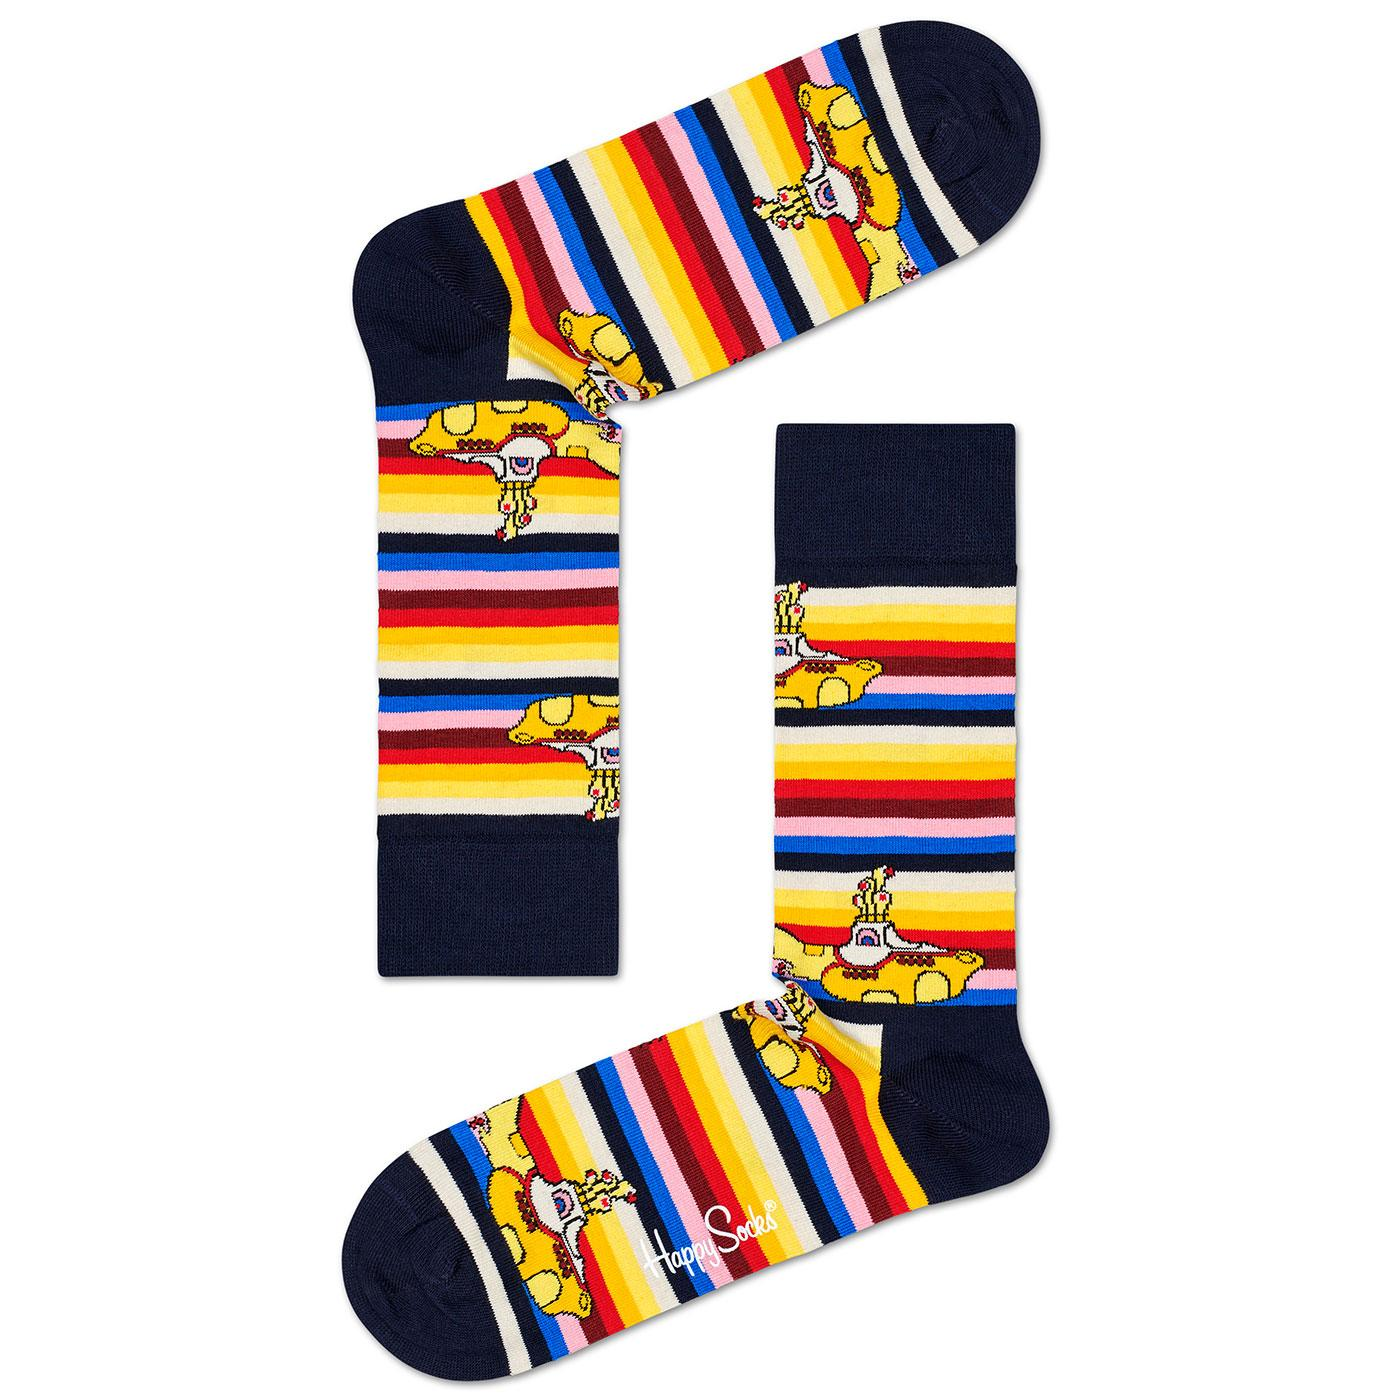 + HAPPY SOCKS x THE BEATLES All On Board Socks